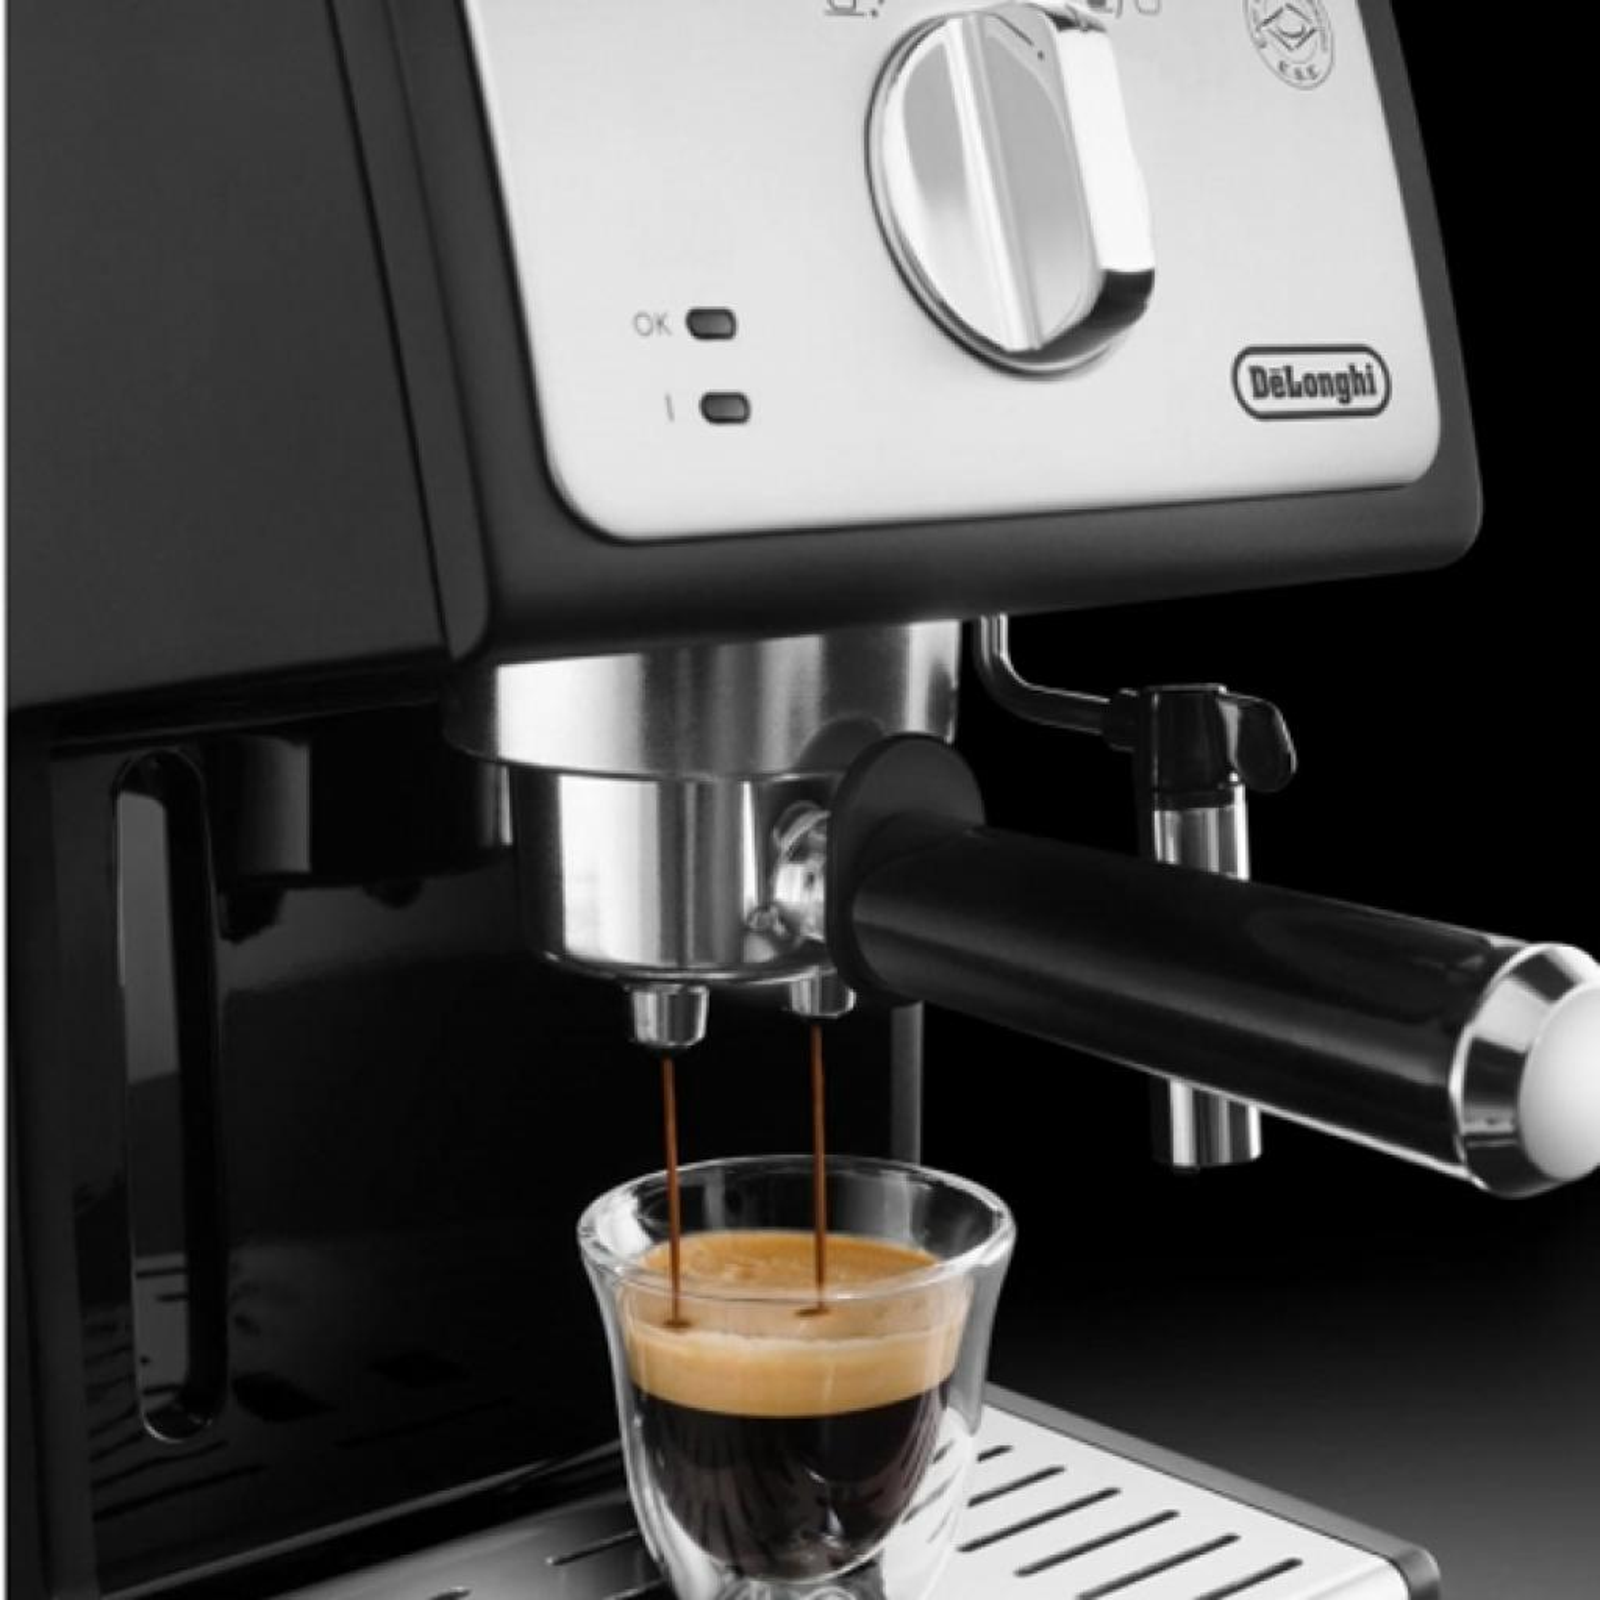 Кофеварка DeLonghi ECP 33.21 BK Silver изображение 3